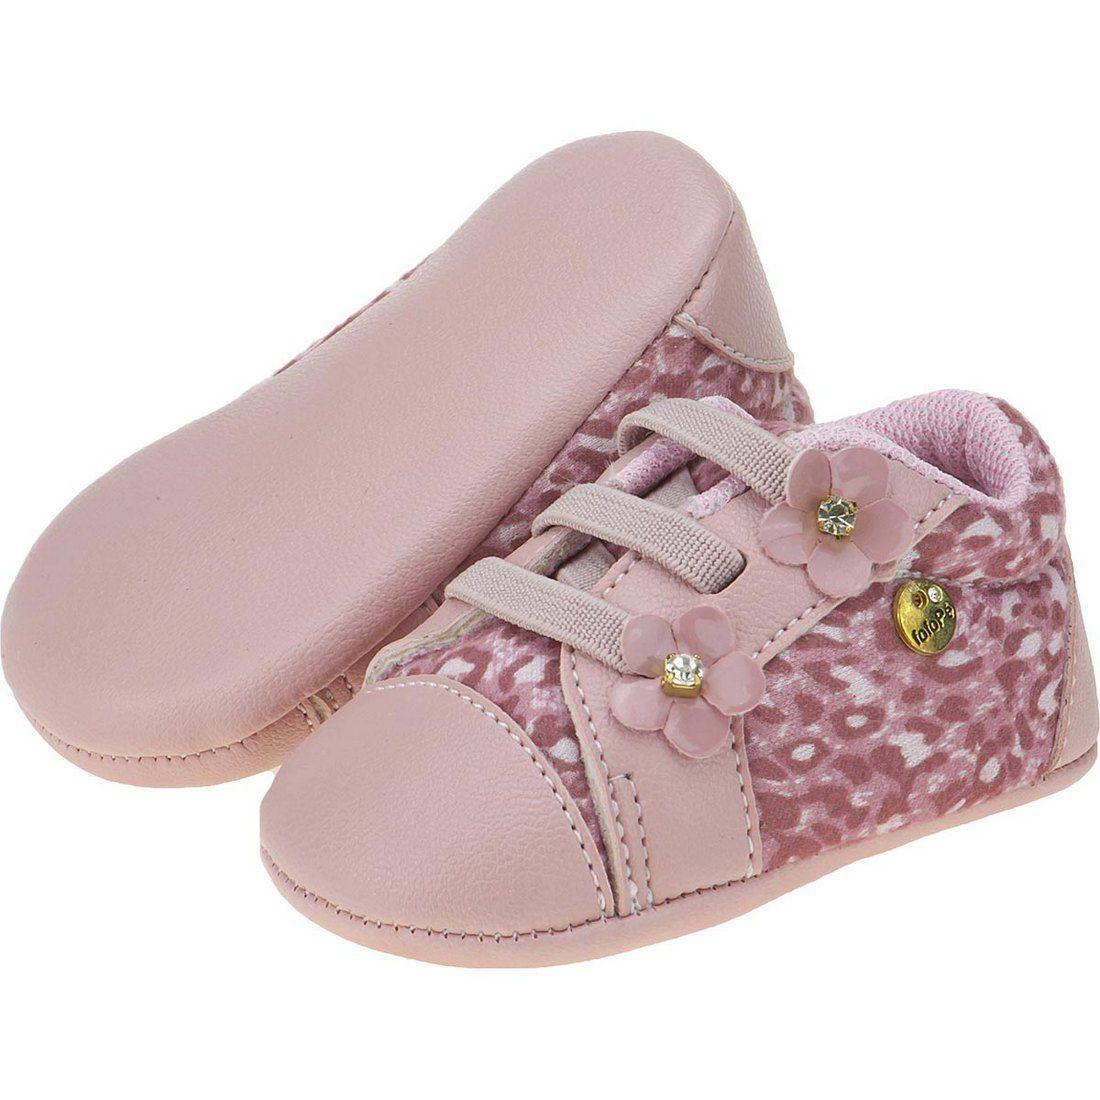 Tênis Casual Bebê Menina Estampa Onça - FOFOPÉ